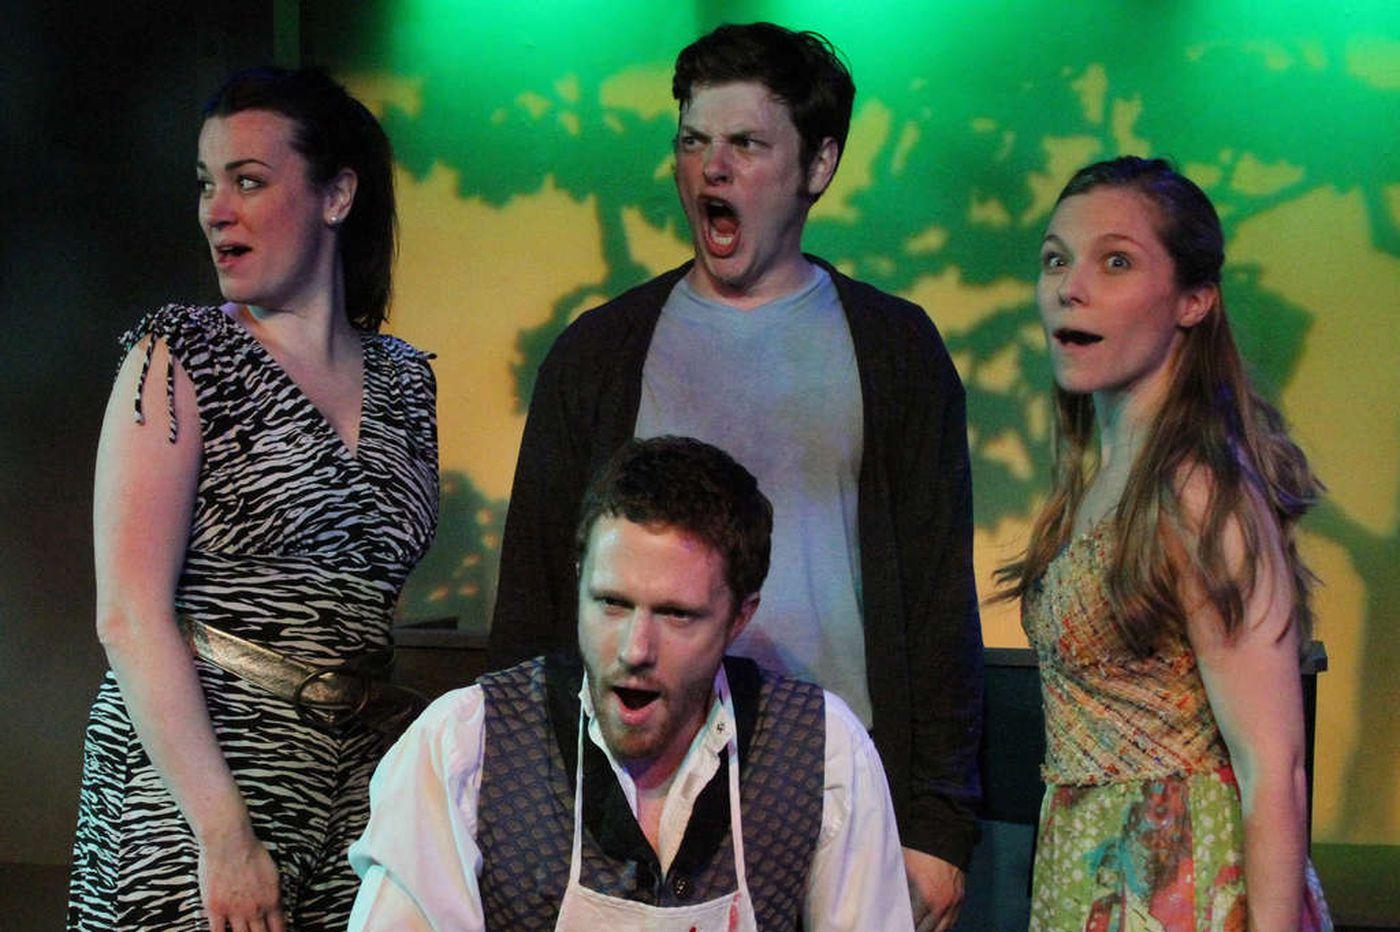 Musicals tomorrow, musicals tonight!